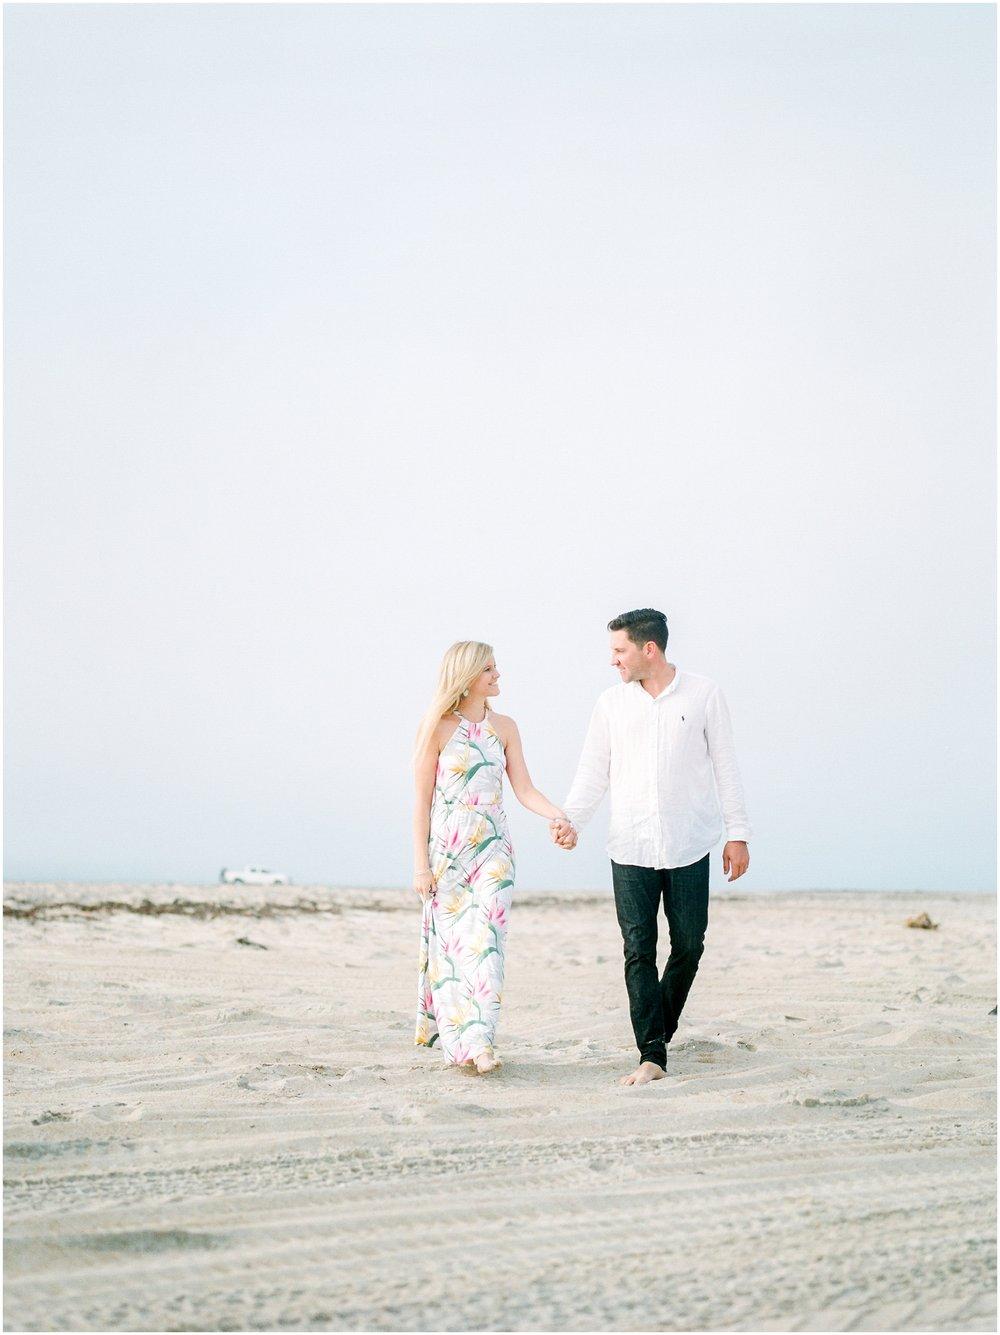 Sunrise Engagement Session at Vilano Beach- Jacksonville, Florida Fine Art Film Wedding Photography_0024.jpg